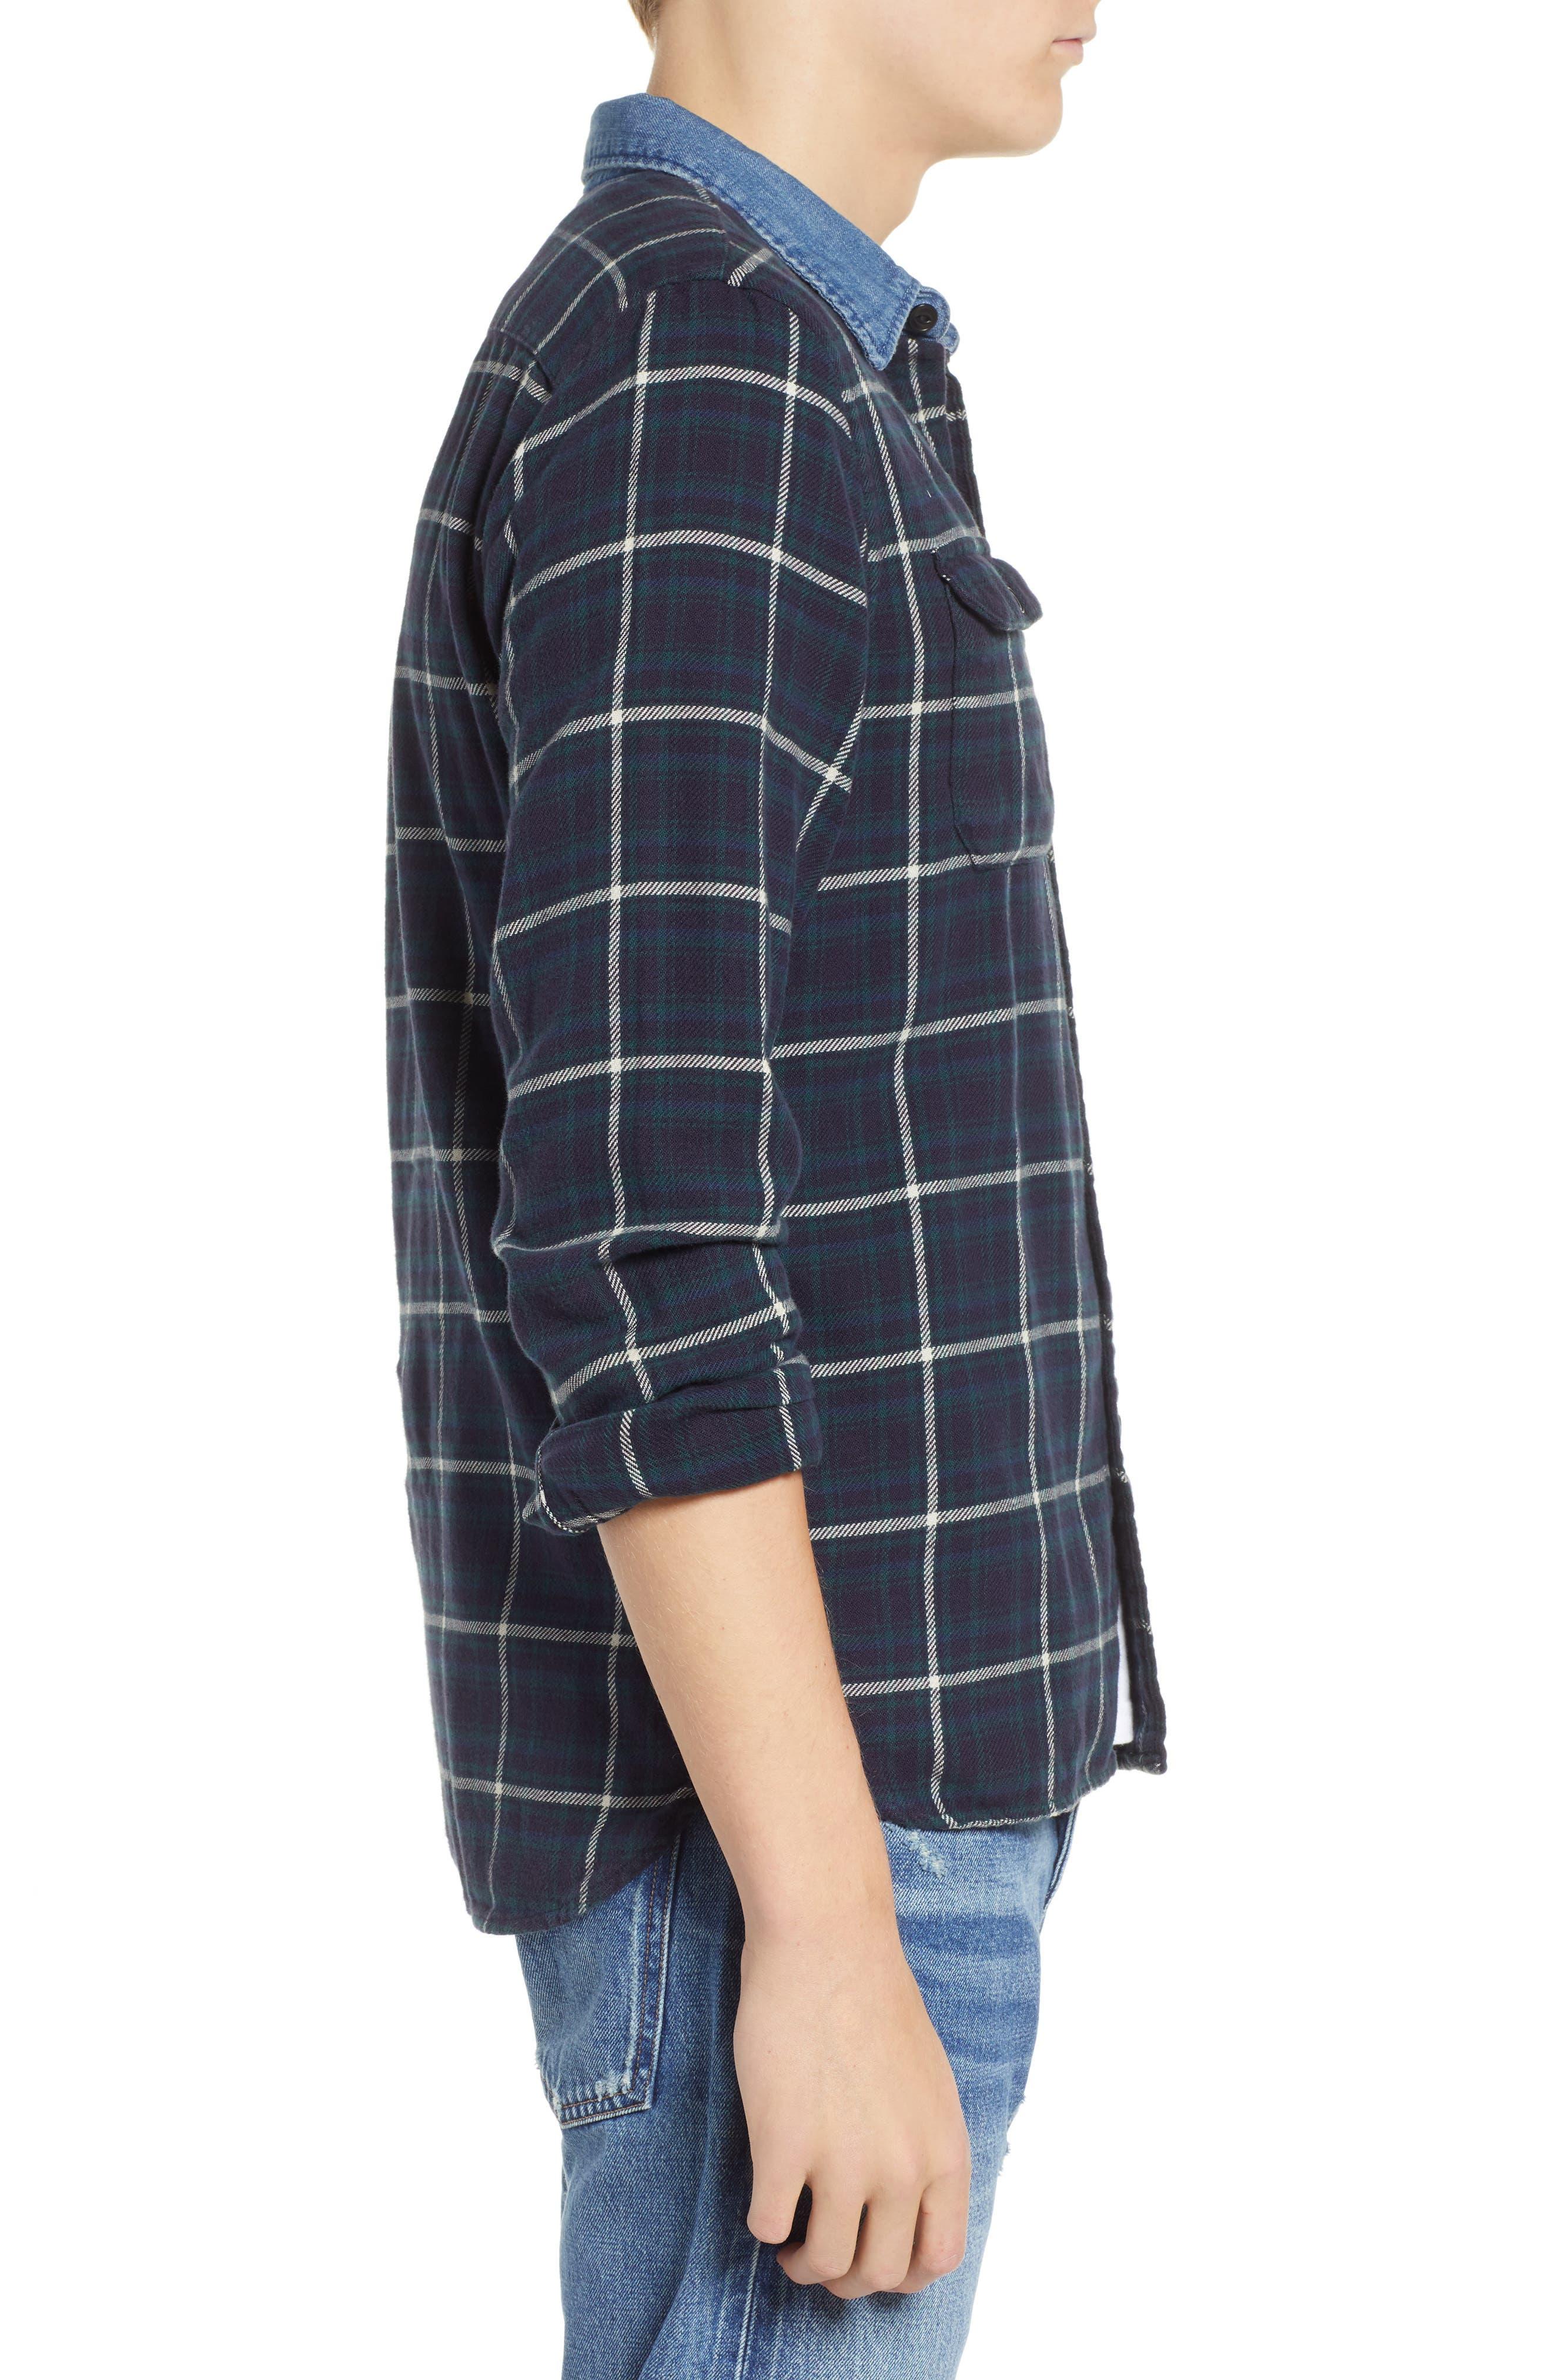 x Justin Timberlake Slim Fit Flannel Worker Shirt,                             Alternate thumbnail 4, color,                             HALLET NIGHT SKY